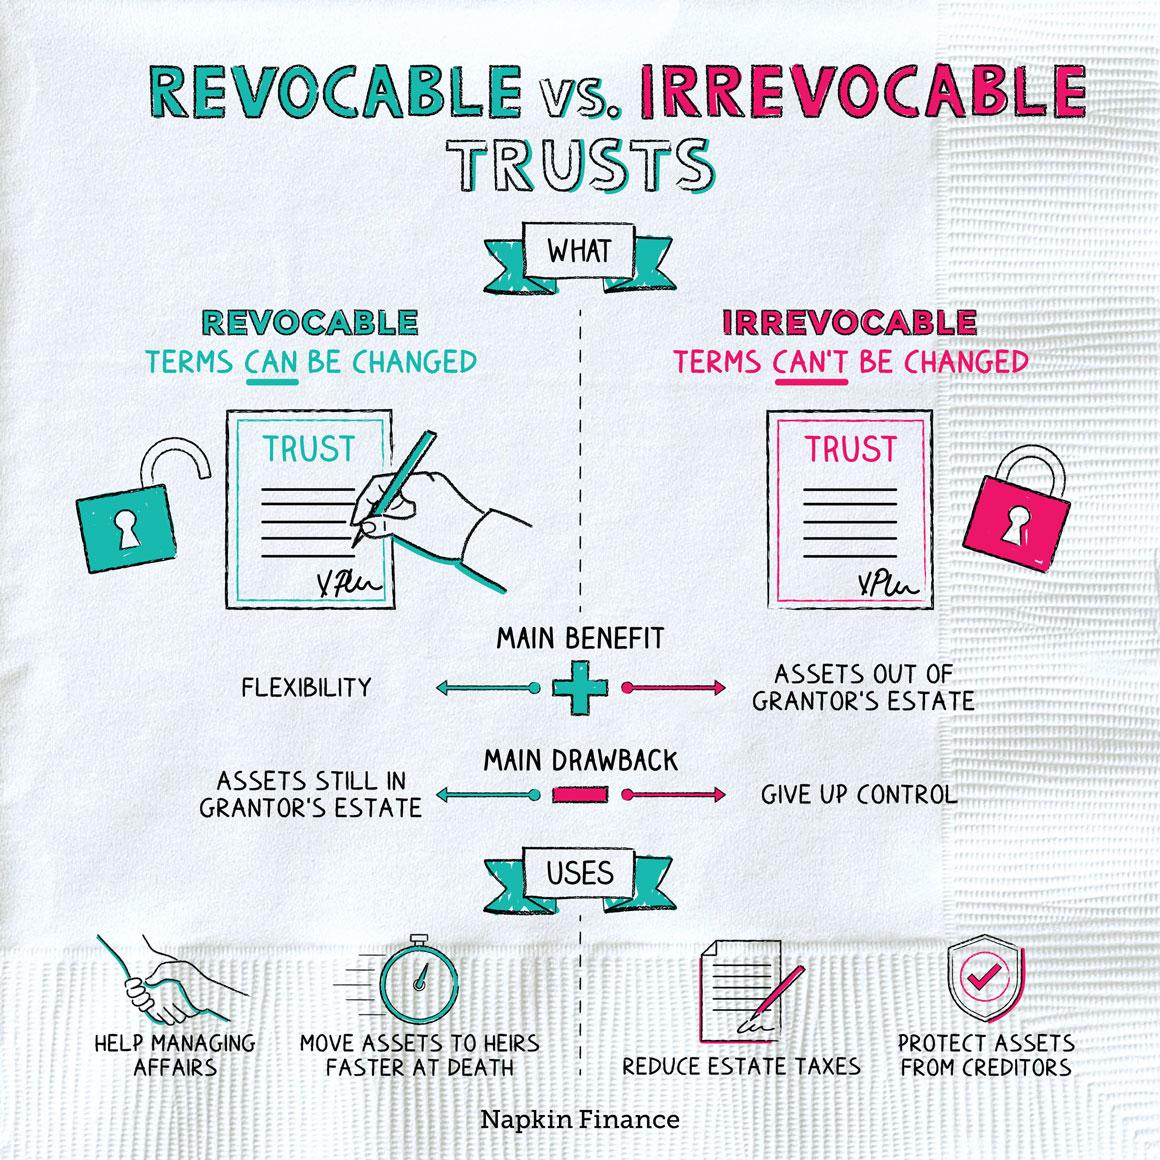 Revocable VS Irrevocable